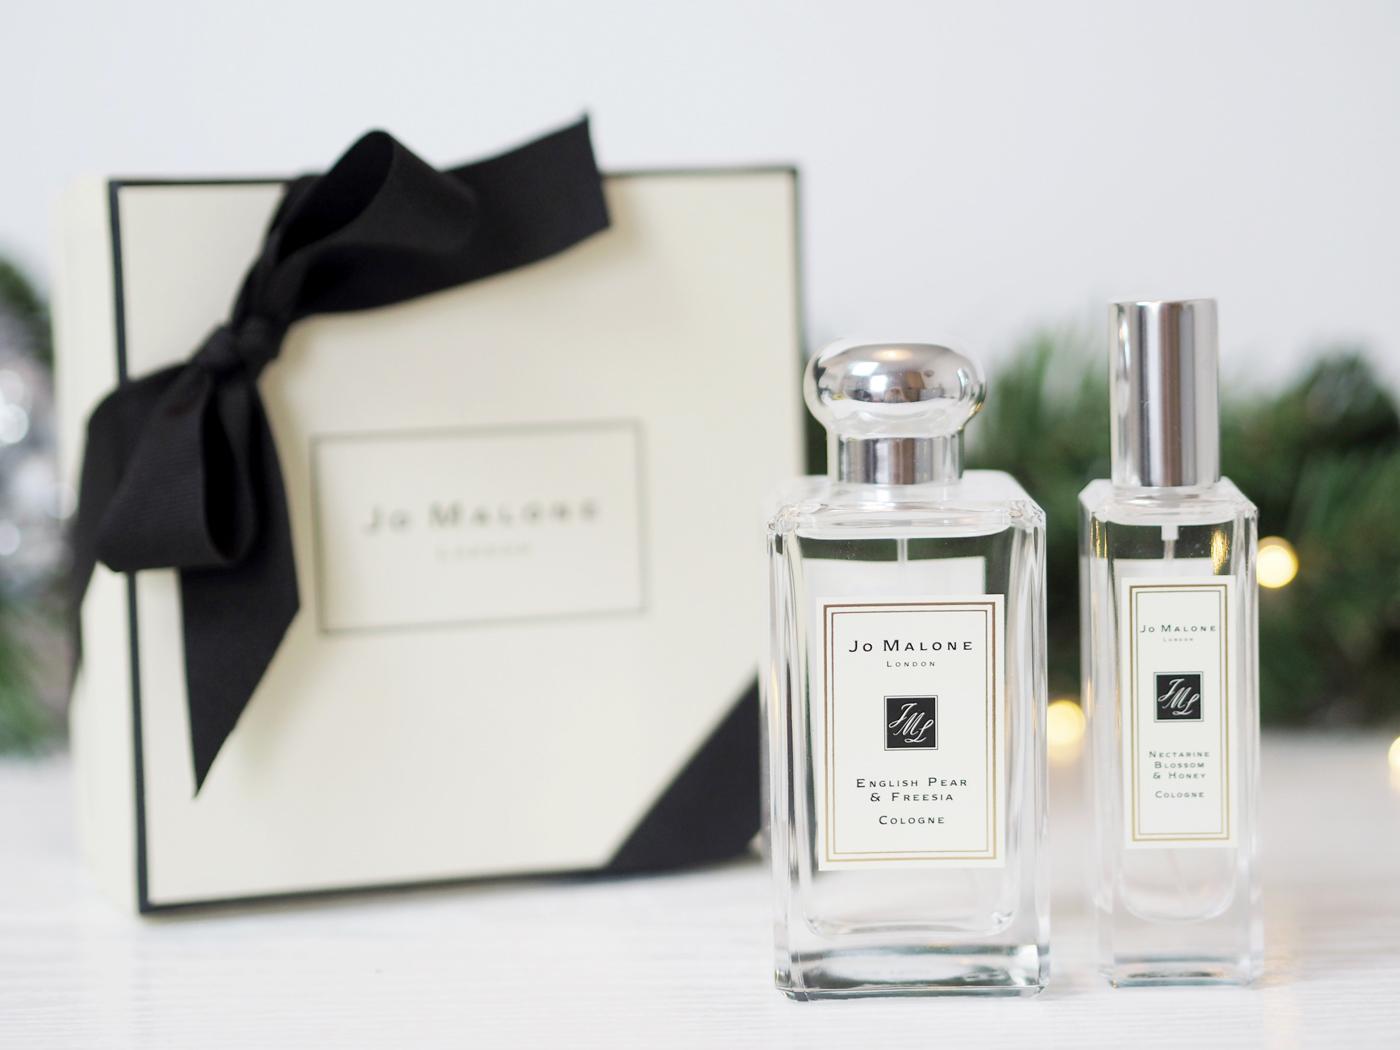 JO MALONE fragrance combining